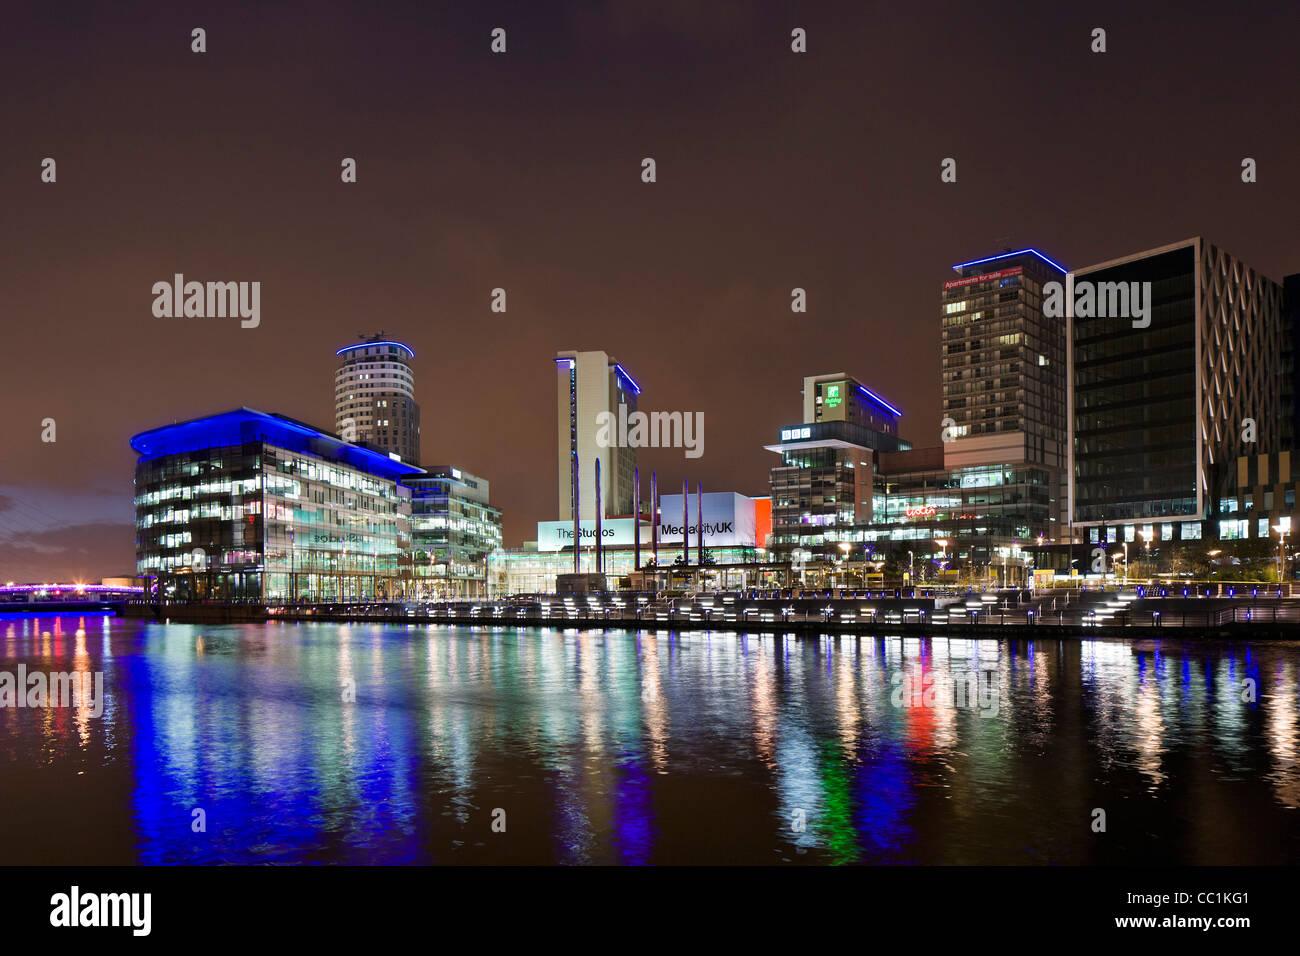 MediaCityUK at night, Salford Quays, Manchester, UK - Stock Image